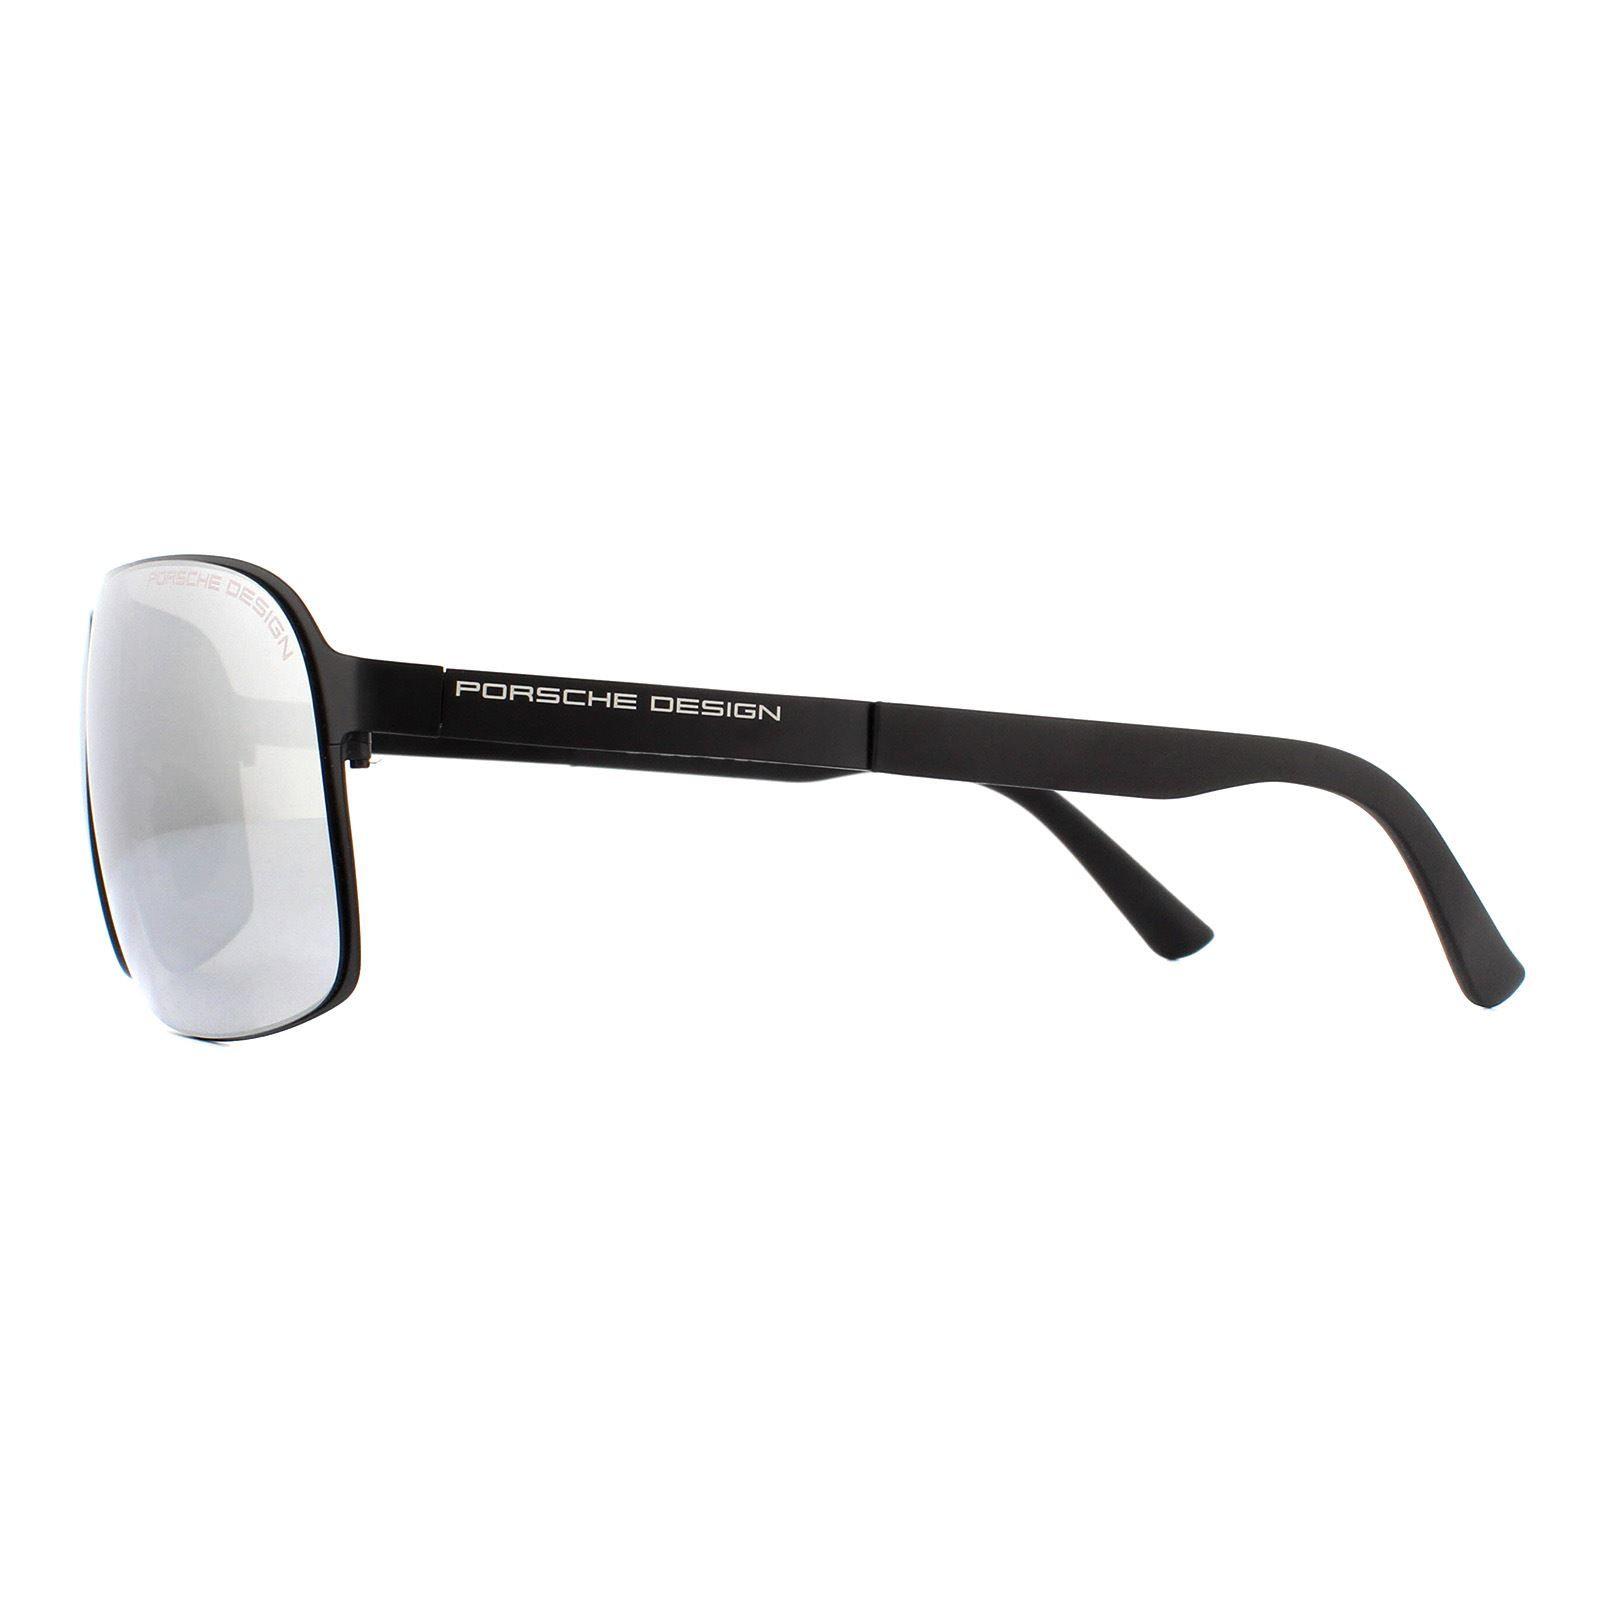 Porsche Design Sunglasses P8579 D Dark Ruthenium Grey